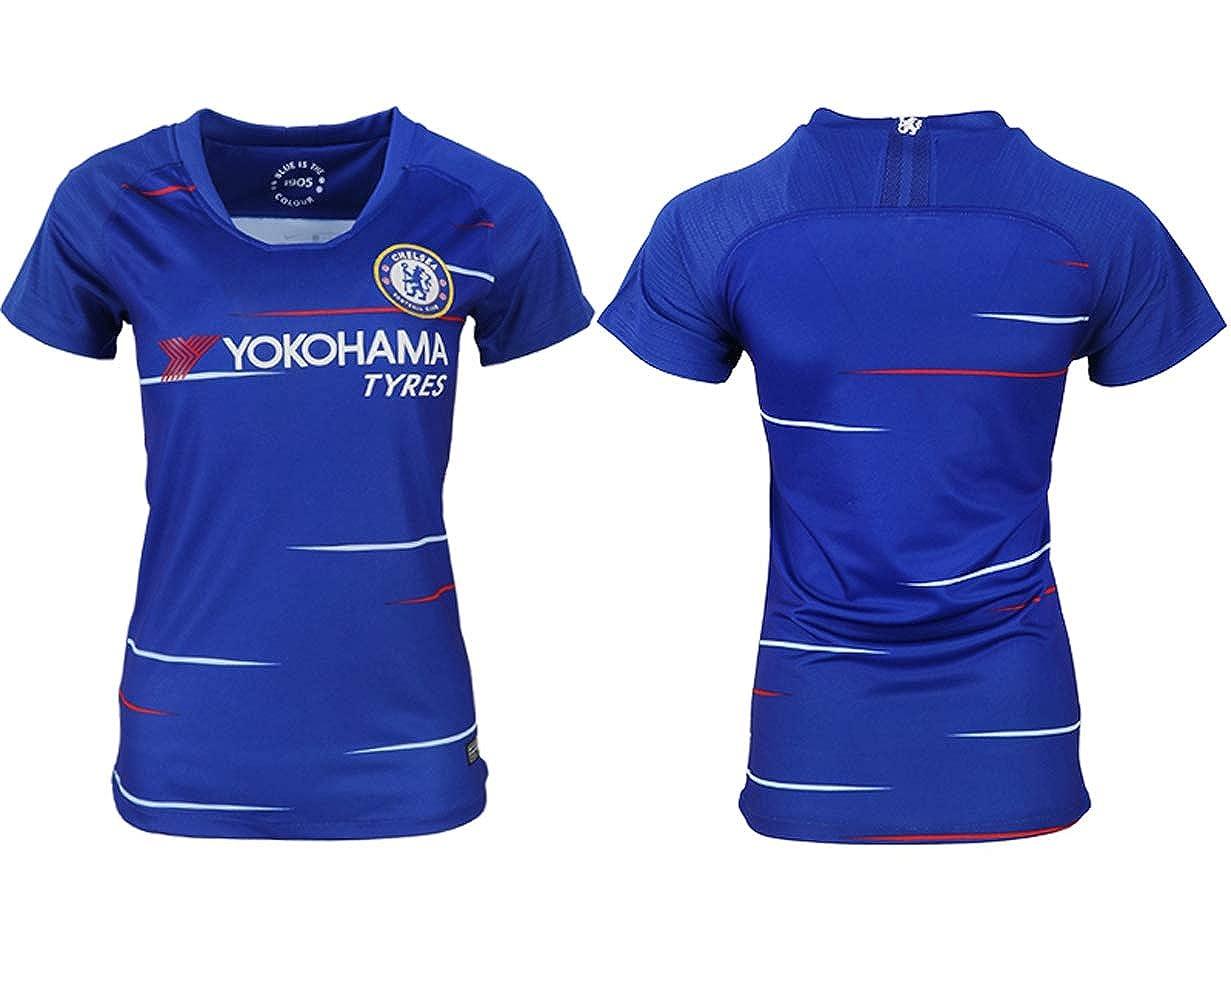 e835de906 Amazon.com  Global sports 2018-2019 Chelsea Women s Home Football Shirt  (XS)  Clothing